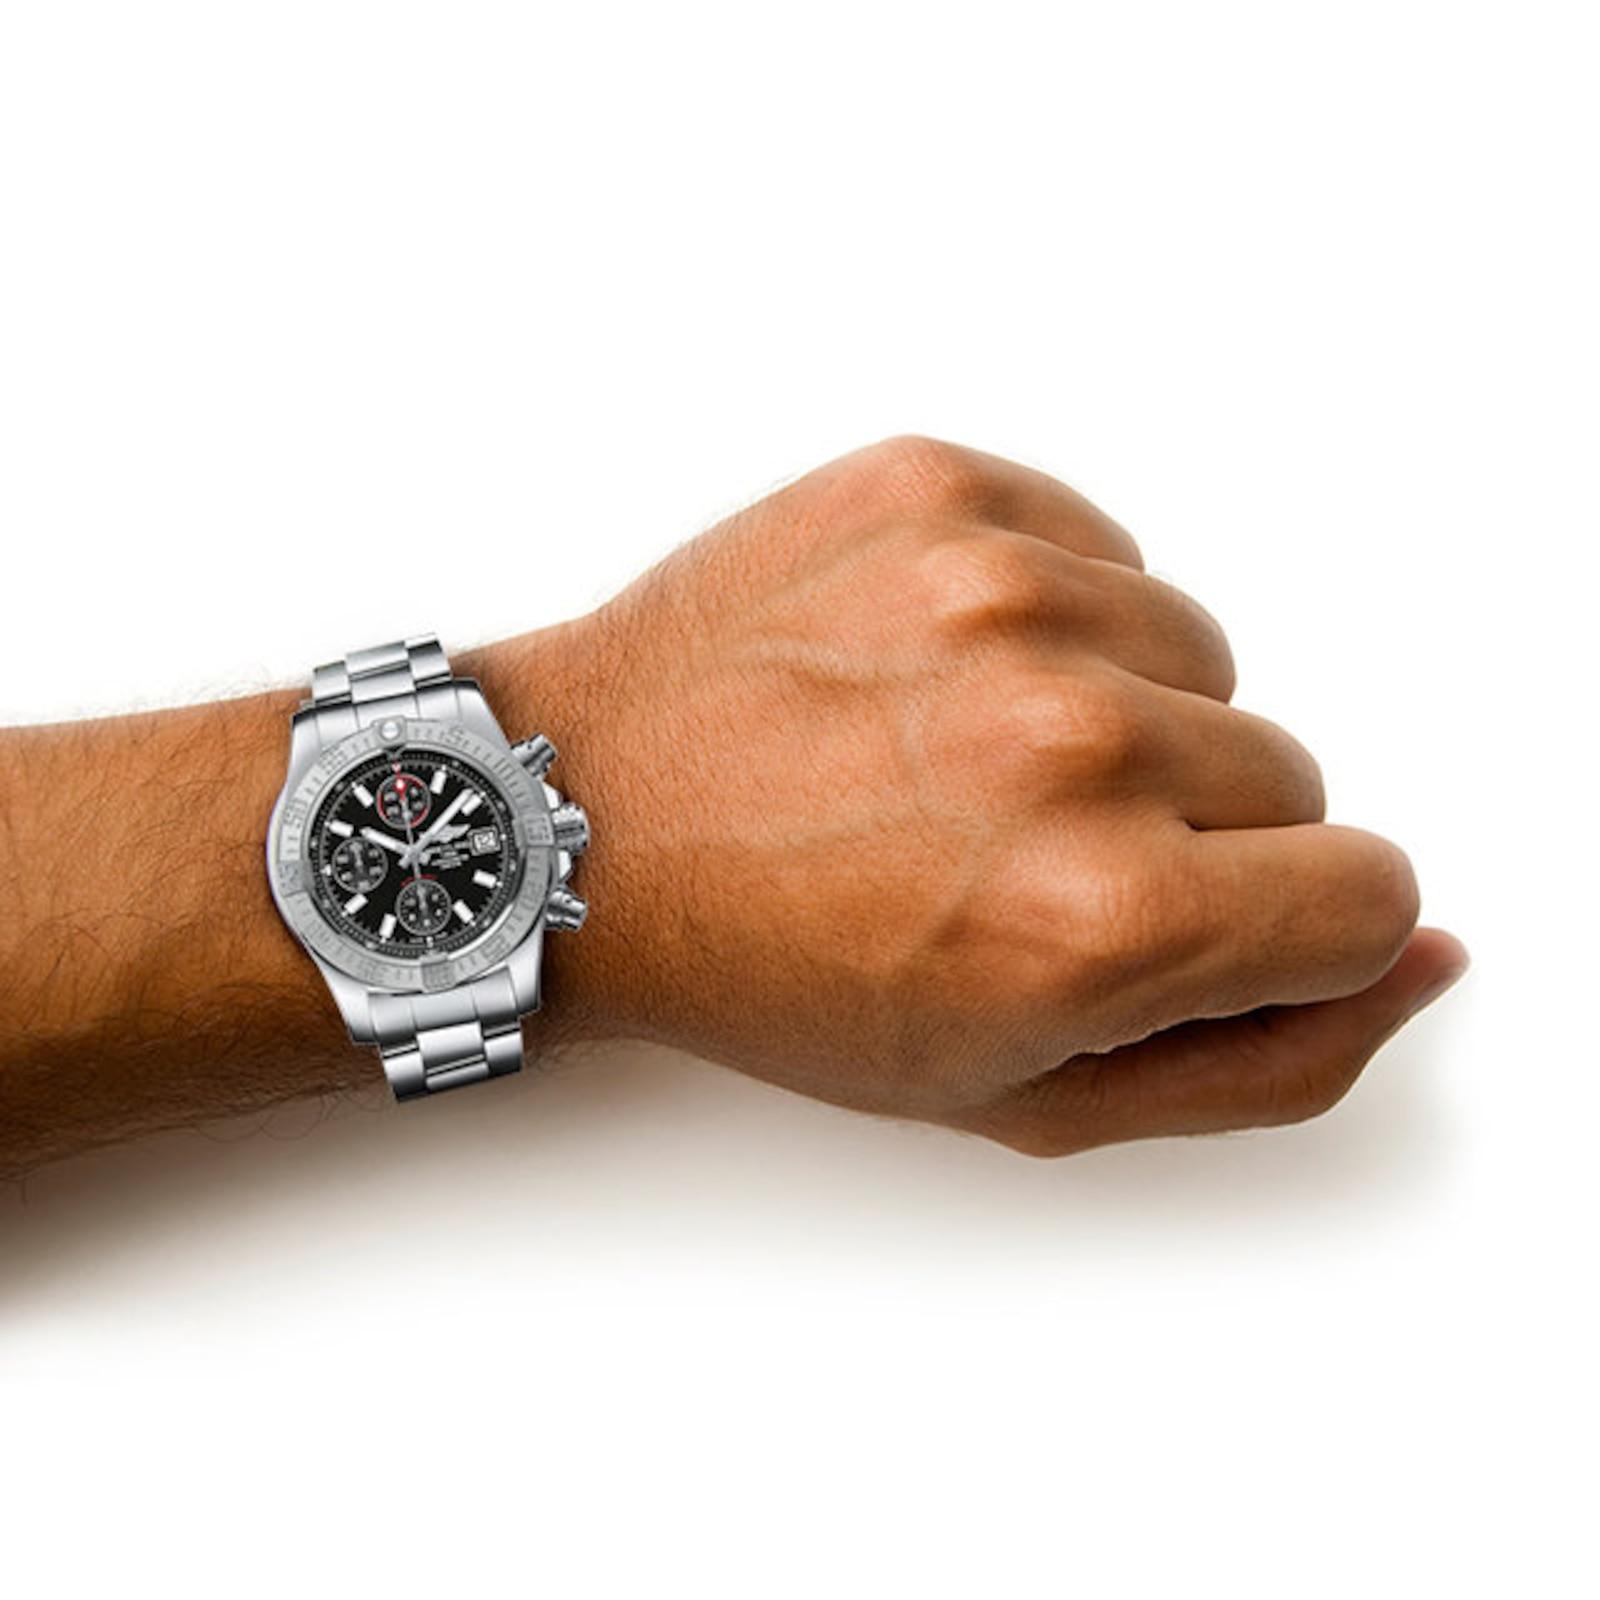 Breitling Avenger II Mens Watch